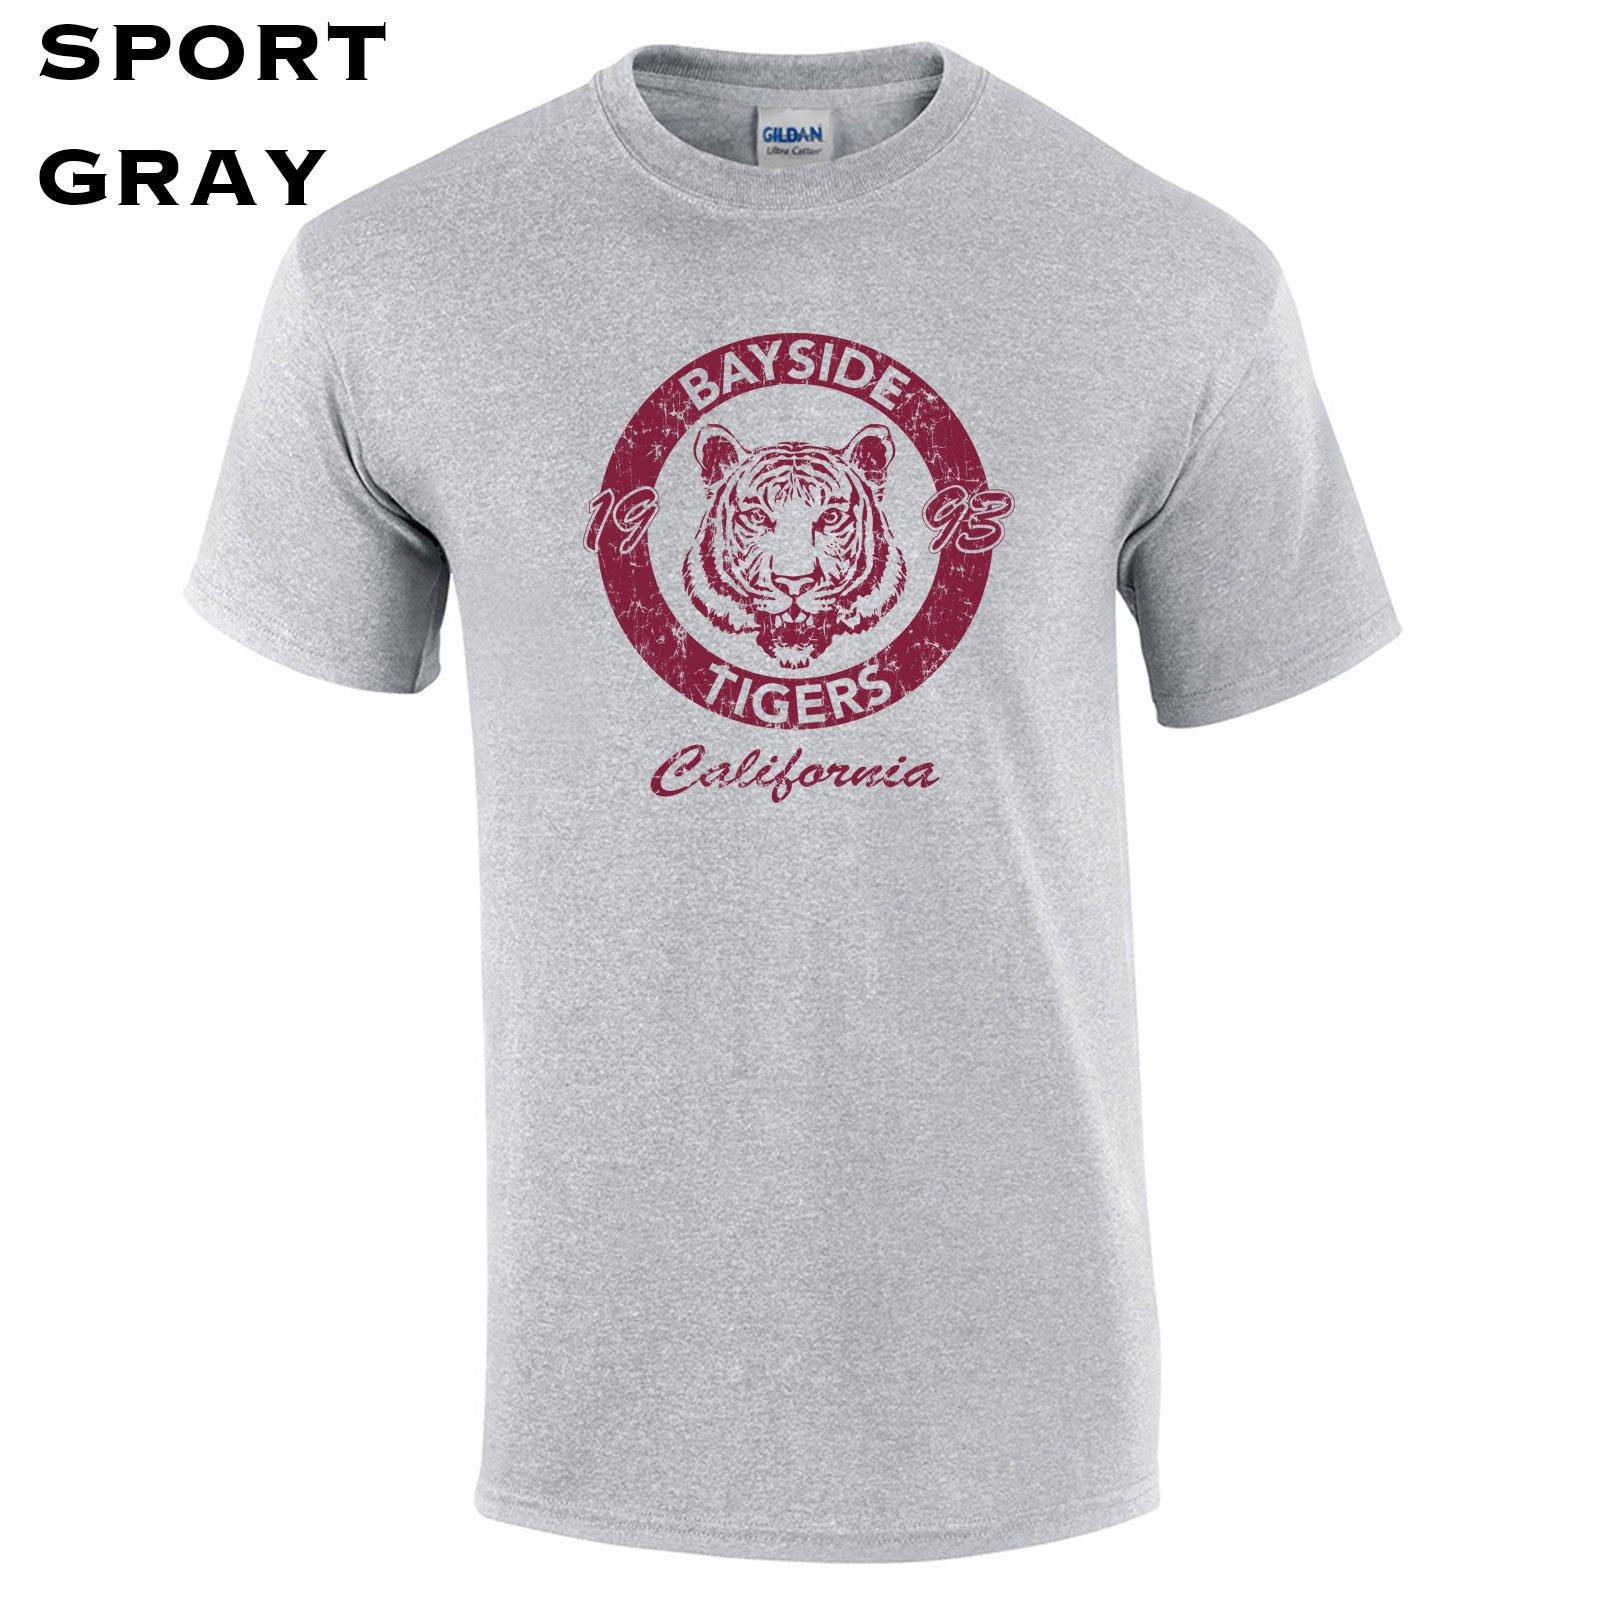 149 Bayside Tigers Funny Shirts